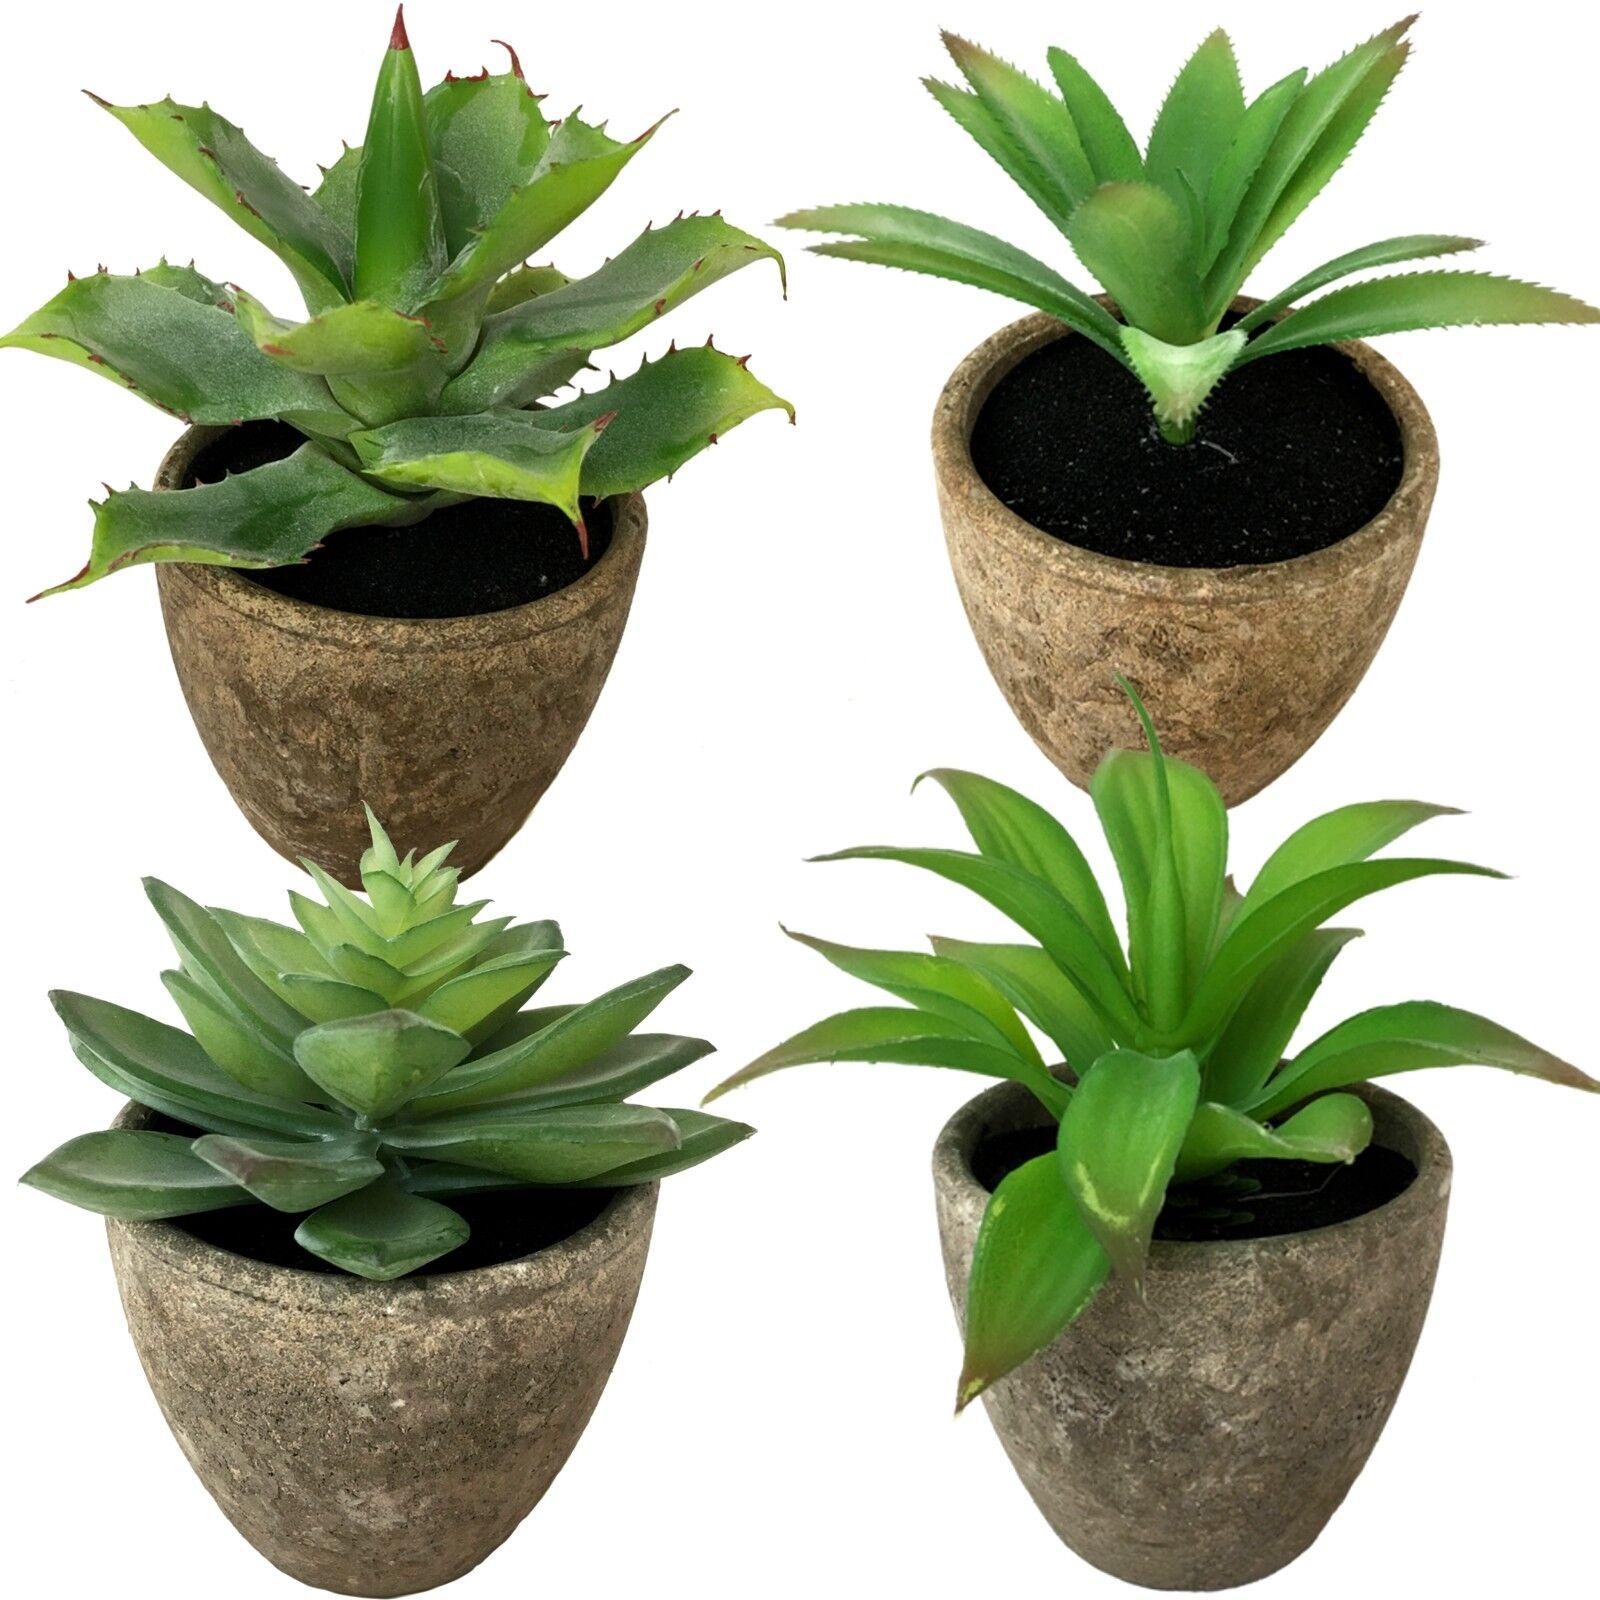 4 x Agave Aloe Vera Sukkulenten Pflanze Topf künstlich Wellness Kaktus NEU 1714B